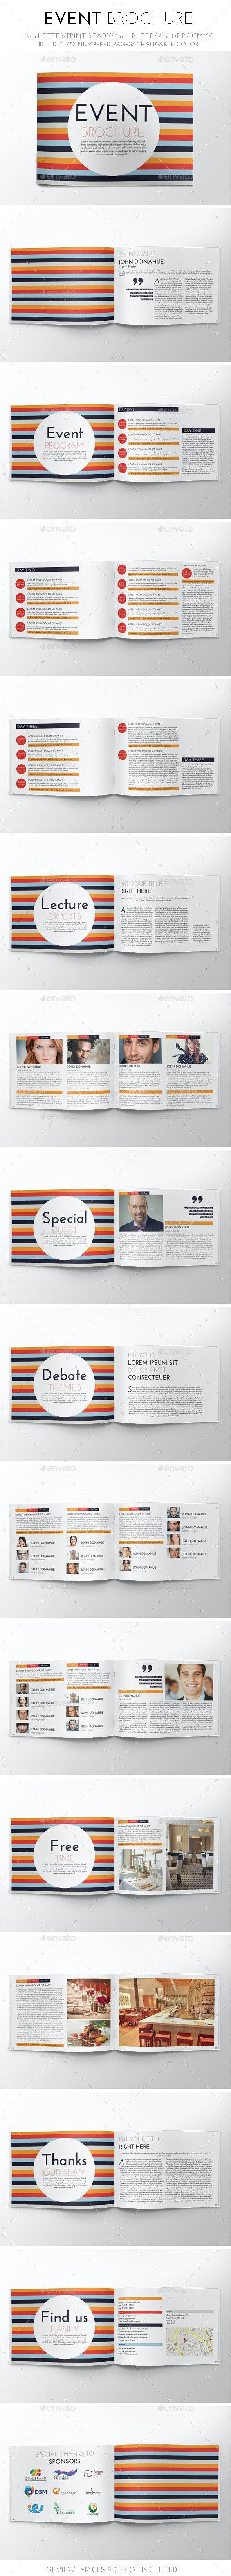 Event Brochure Template - Brochures Print Templates